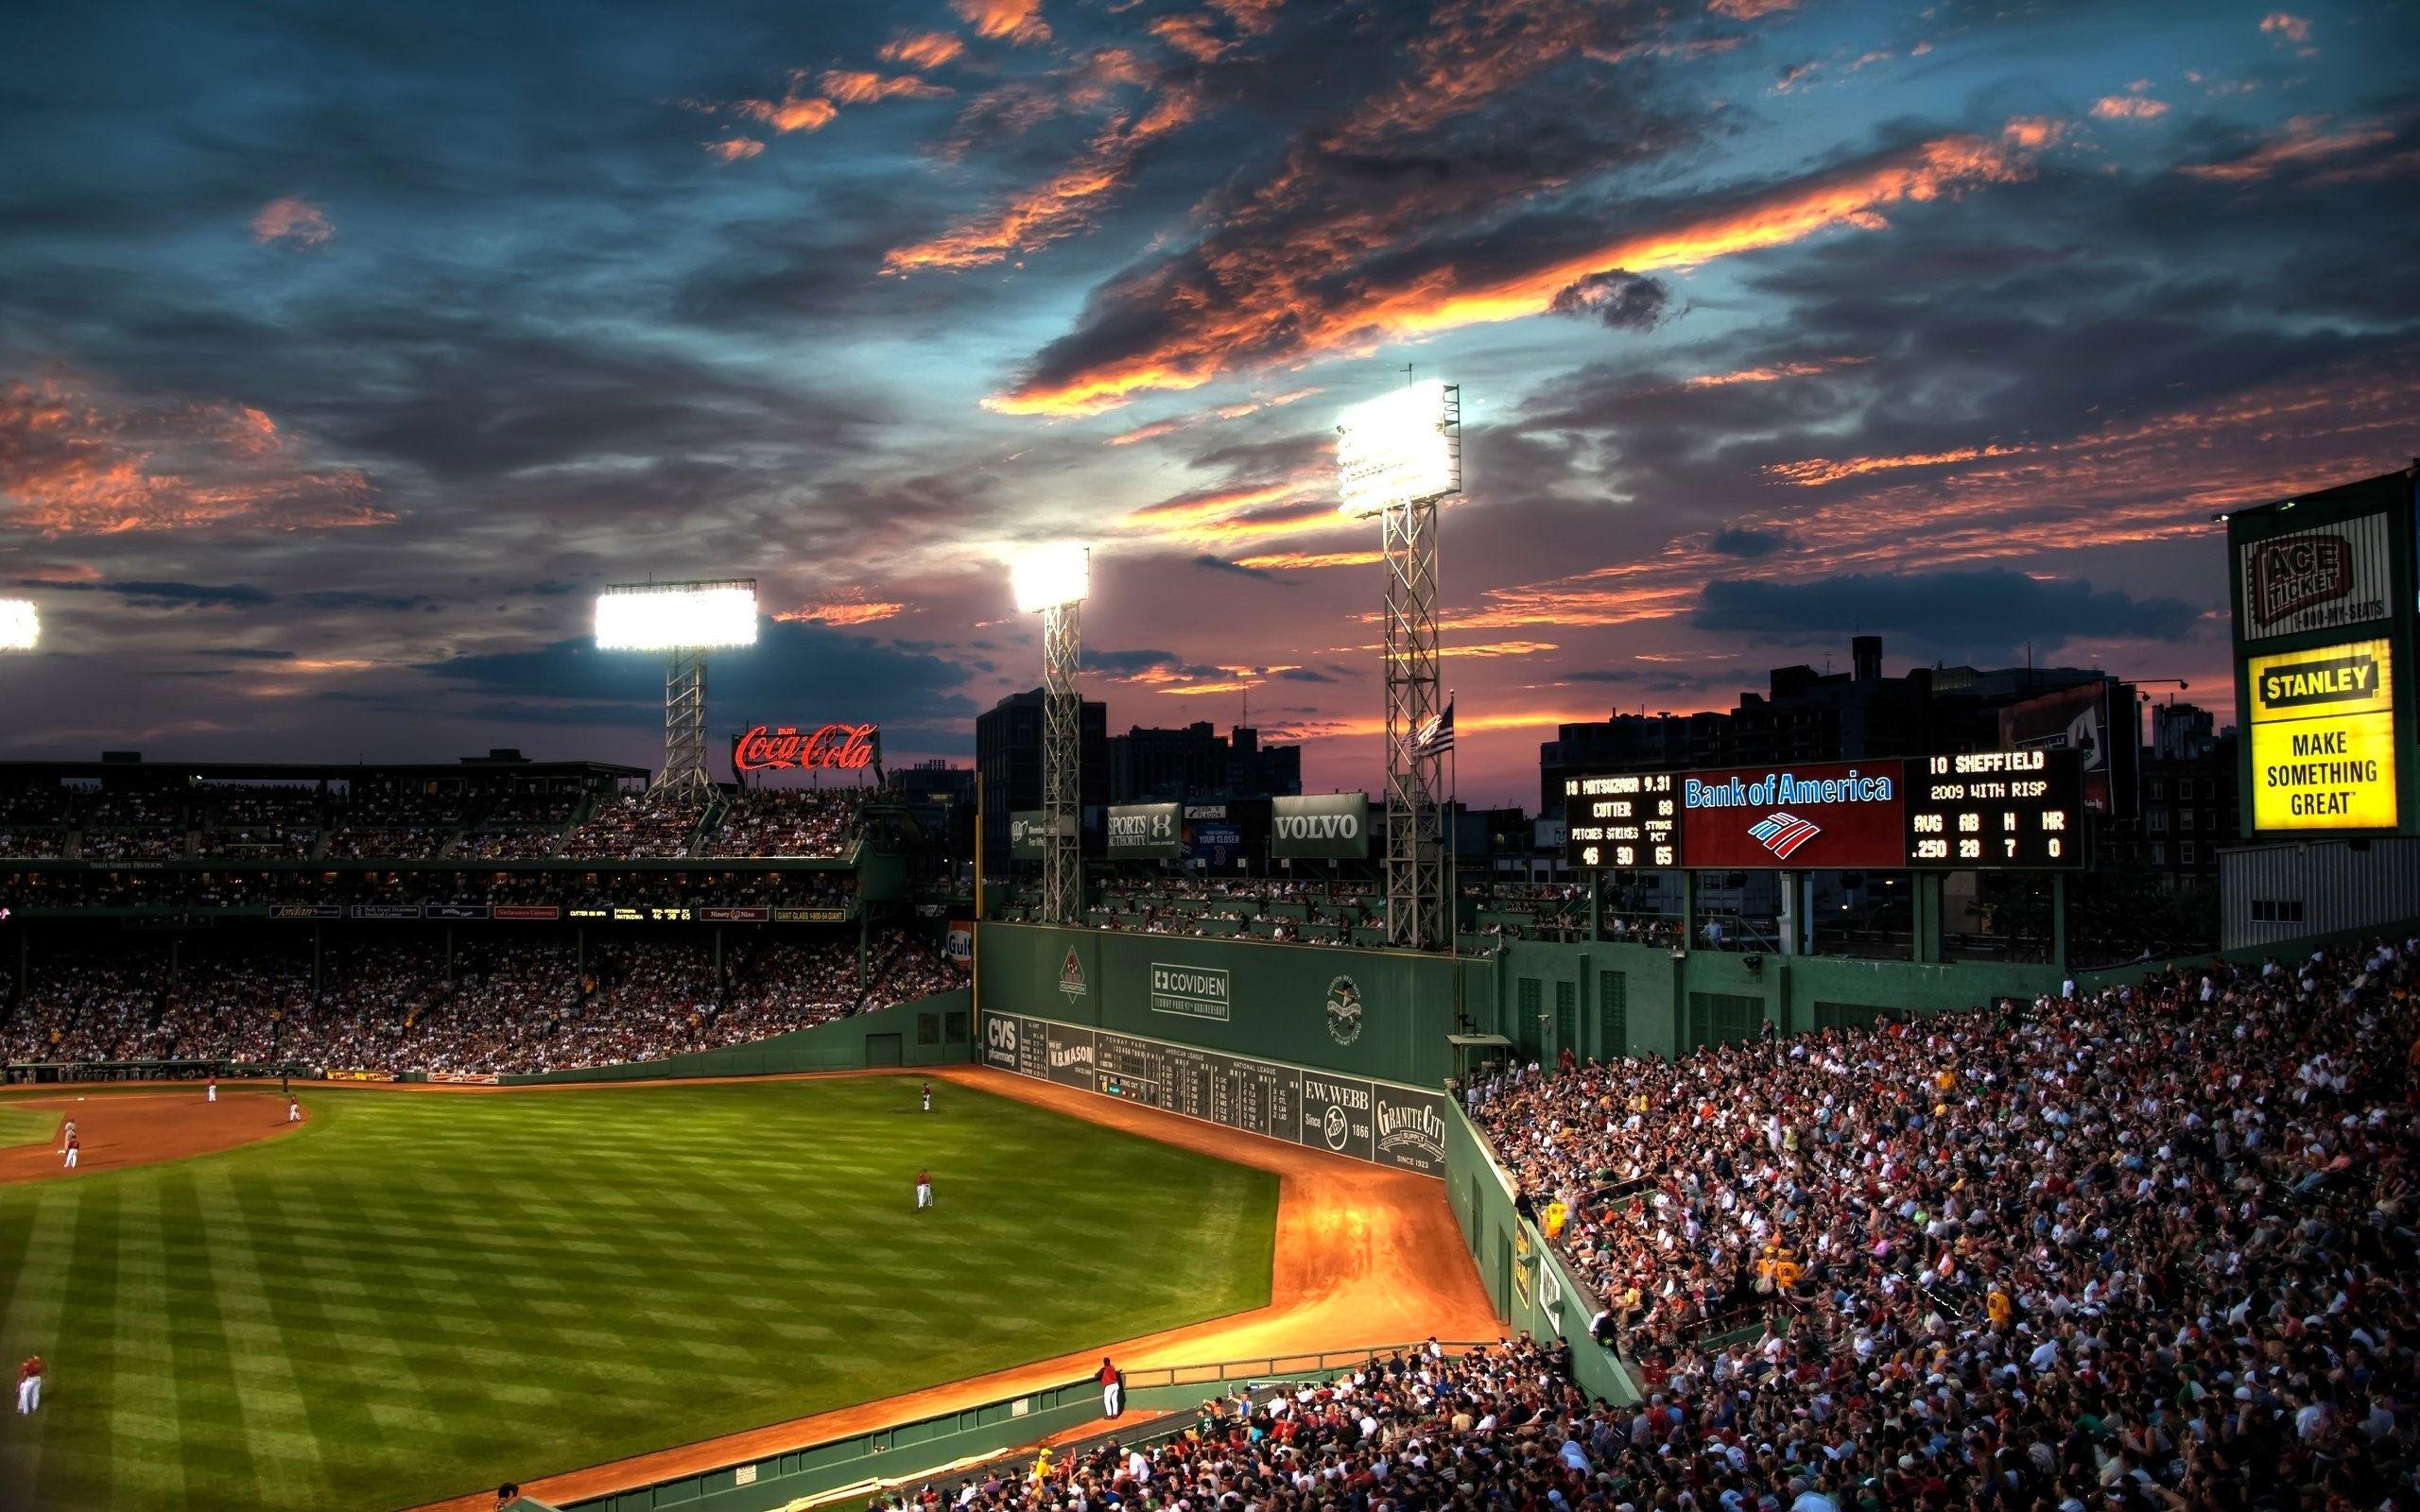 180 Baseball HD Wallpapers | Backgrounds - Wallpaper Abyss